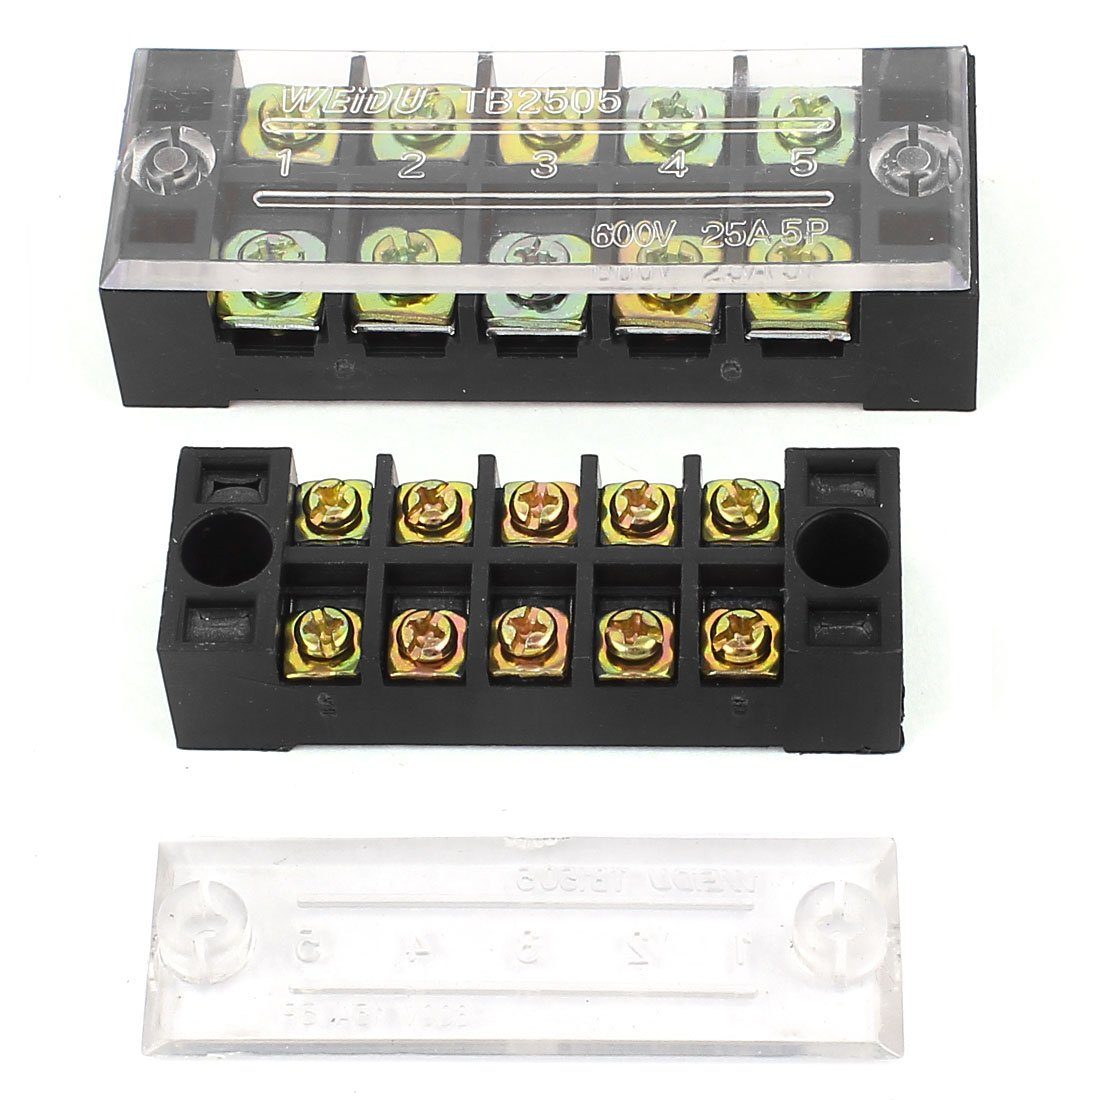 2Pcs 600V 15A/25A Dual Row 5 Position Barrier Terminal Strip Block Set